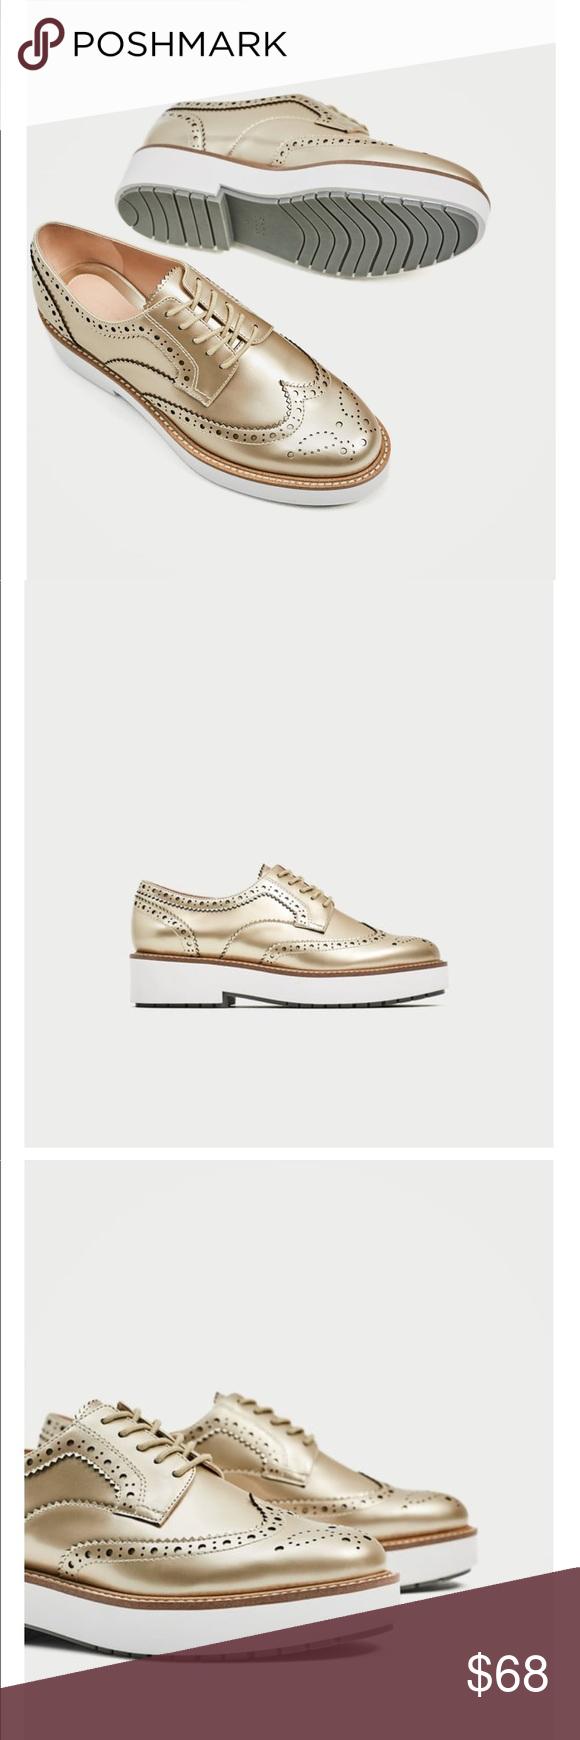 Zara Gold Platform Brogues | Zara gold